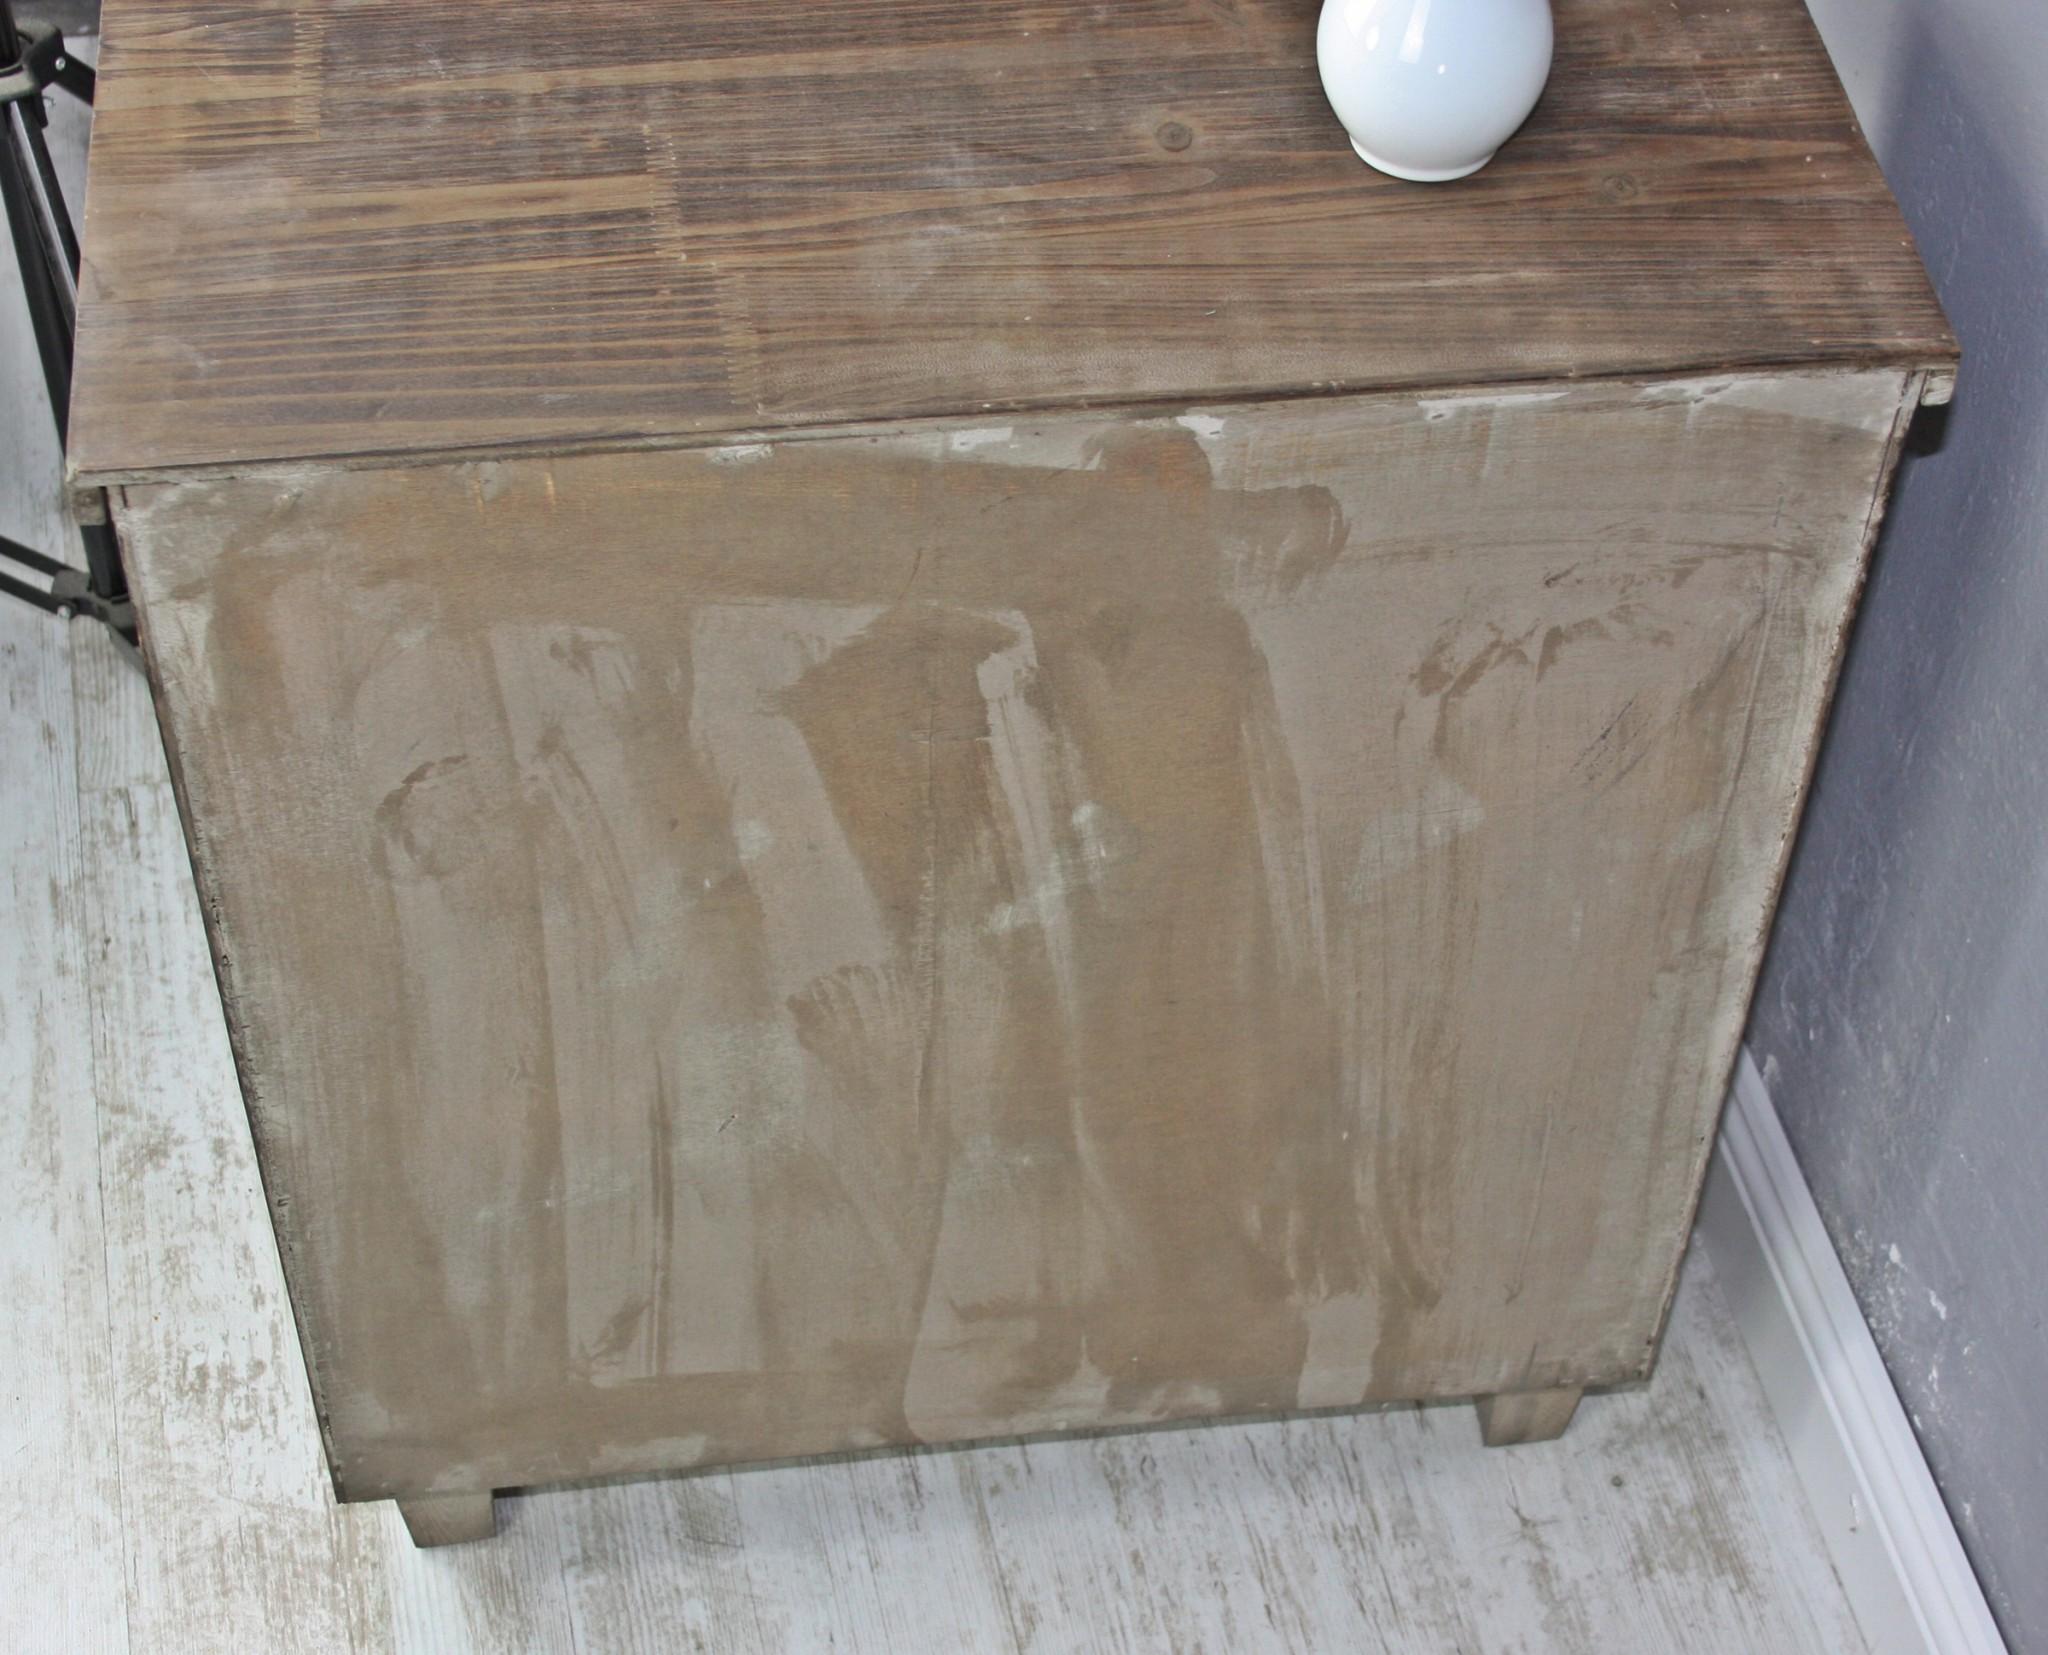 kommode schrank holz wei bunt antik landhaus shabby schubladen massiv 68x60x30. Black Bedroom Furniture Sets. Home Design Ideas